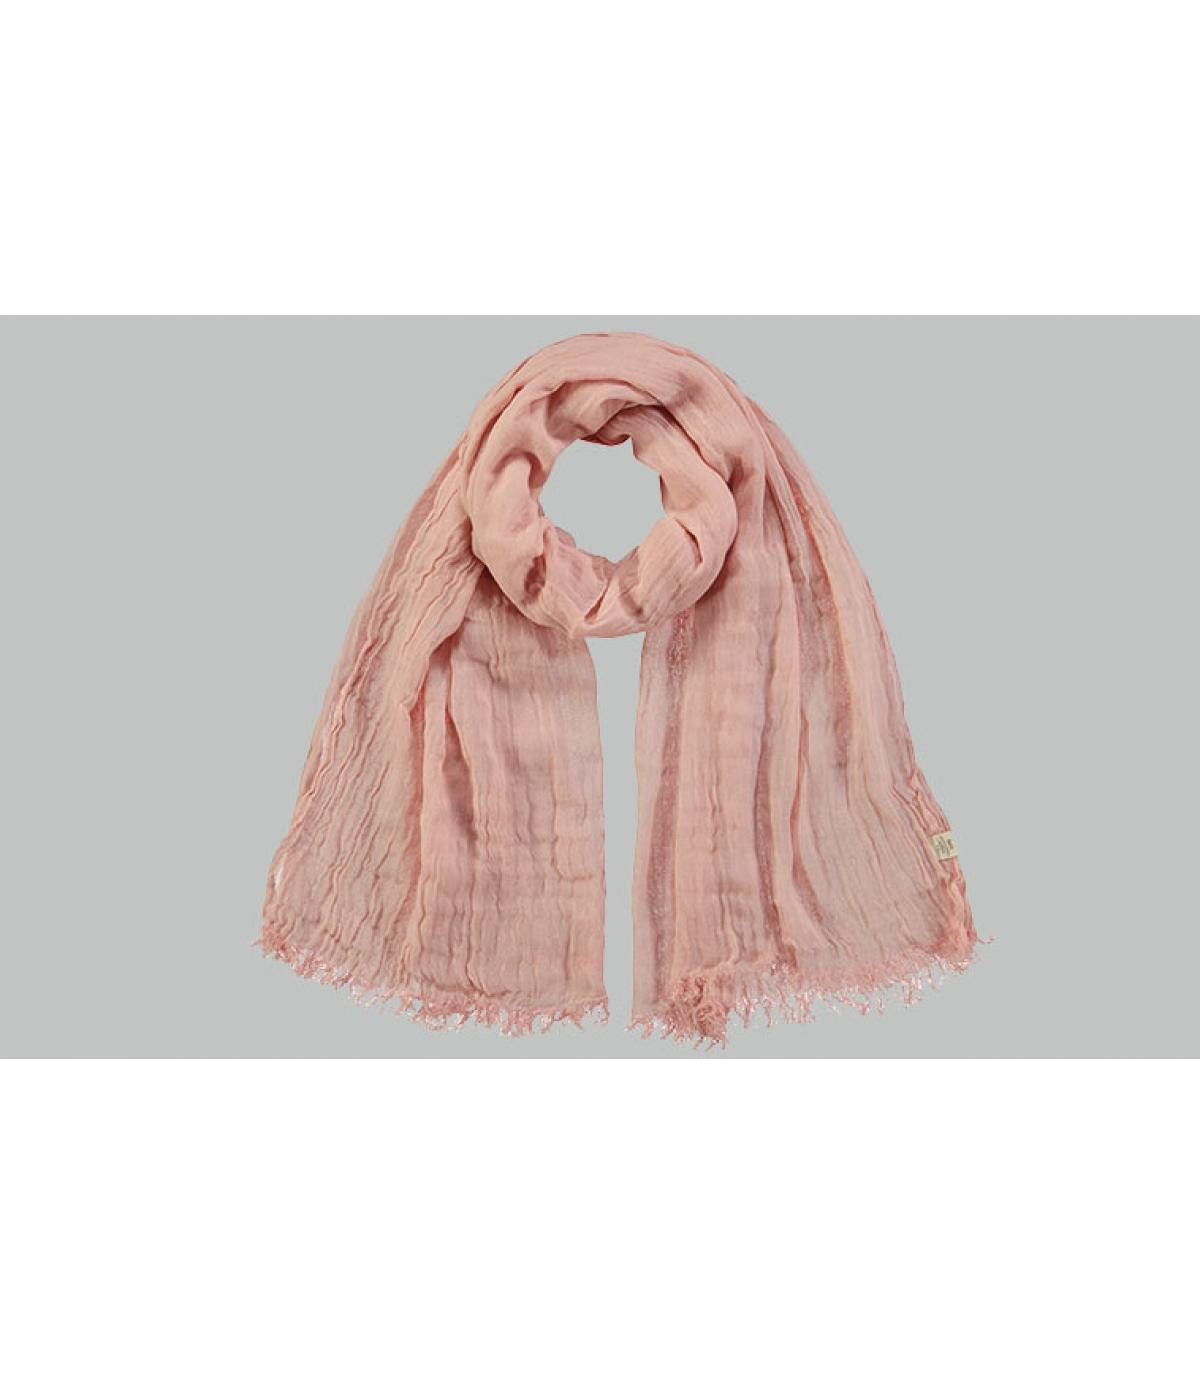 fular algodón rosa